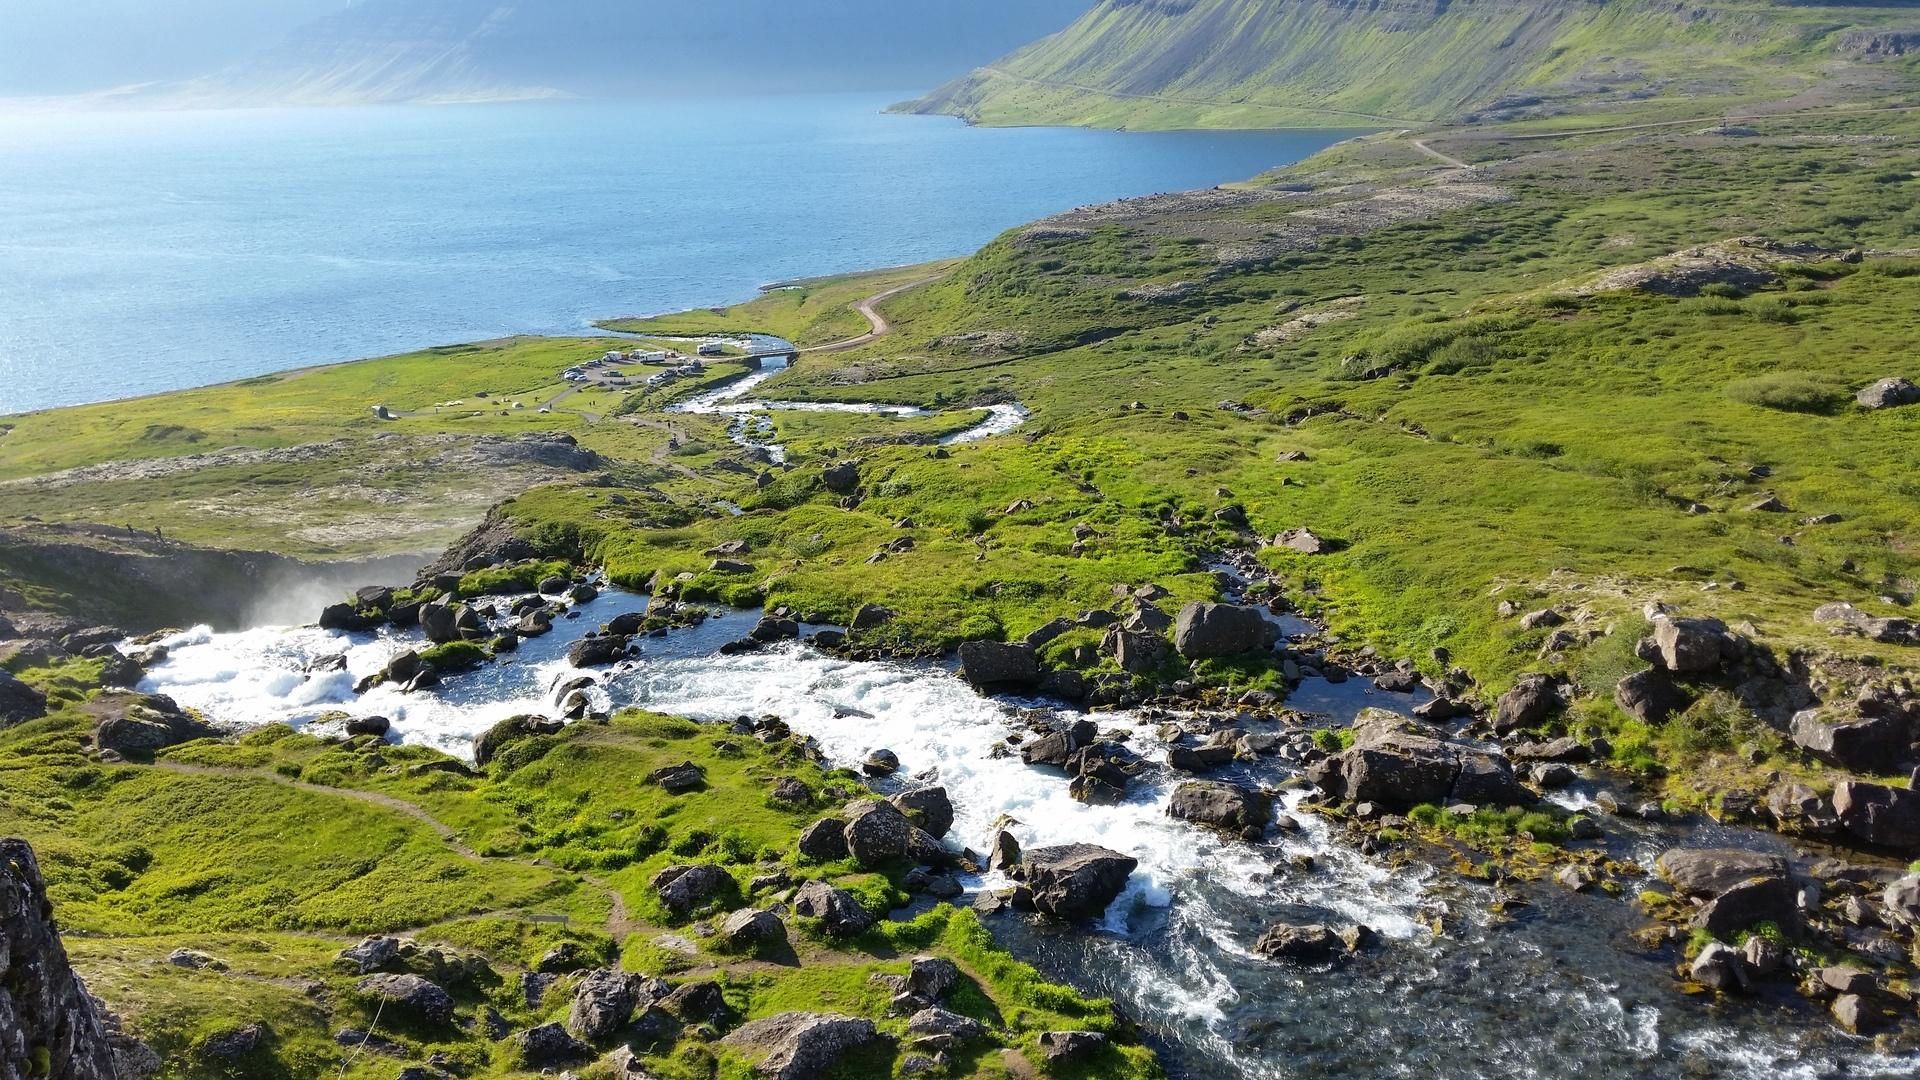 5 juillet : d'Isafjordur à Dynjandi